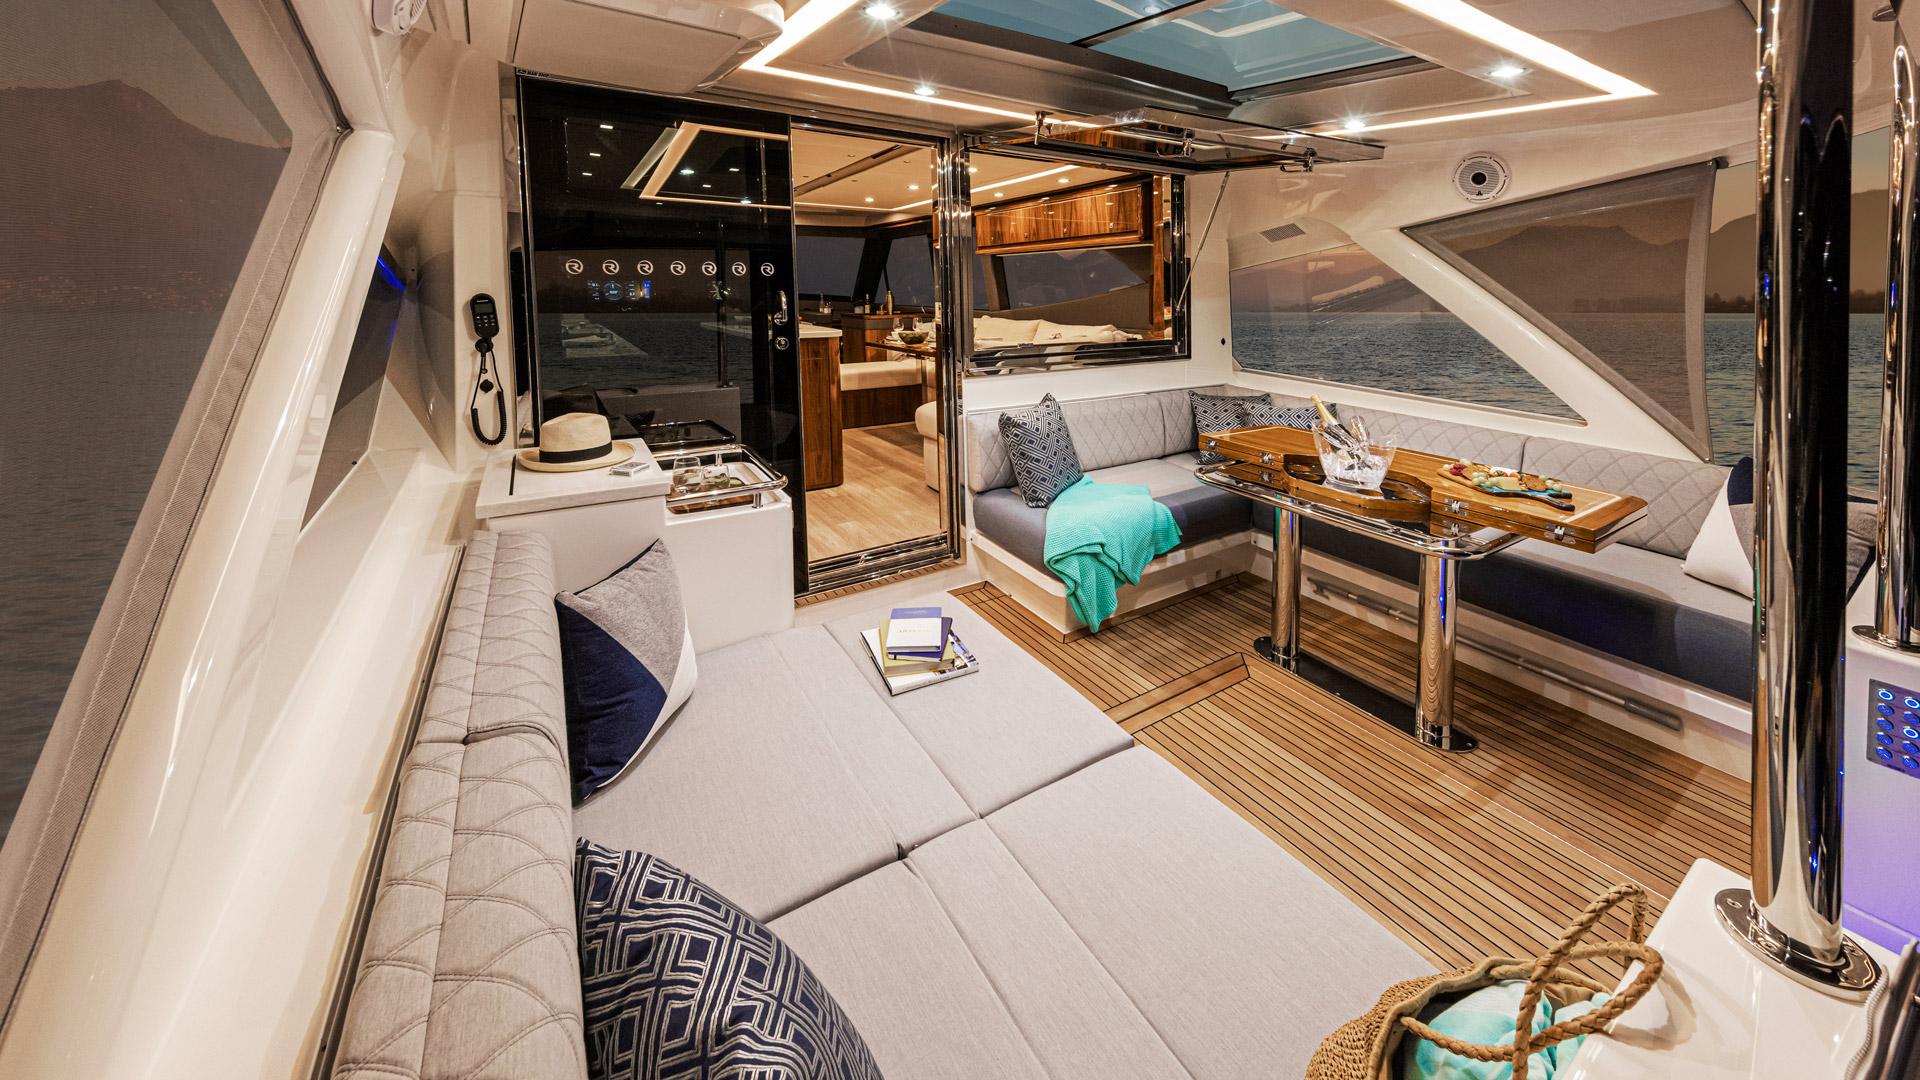 alfresco dining area onboard the Riviera 645 SUV